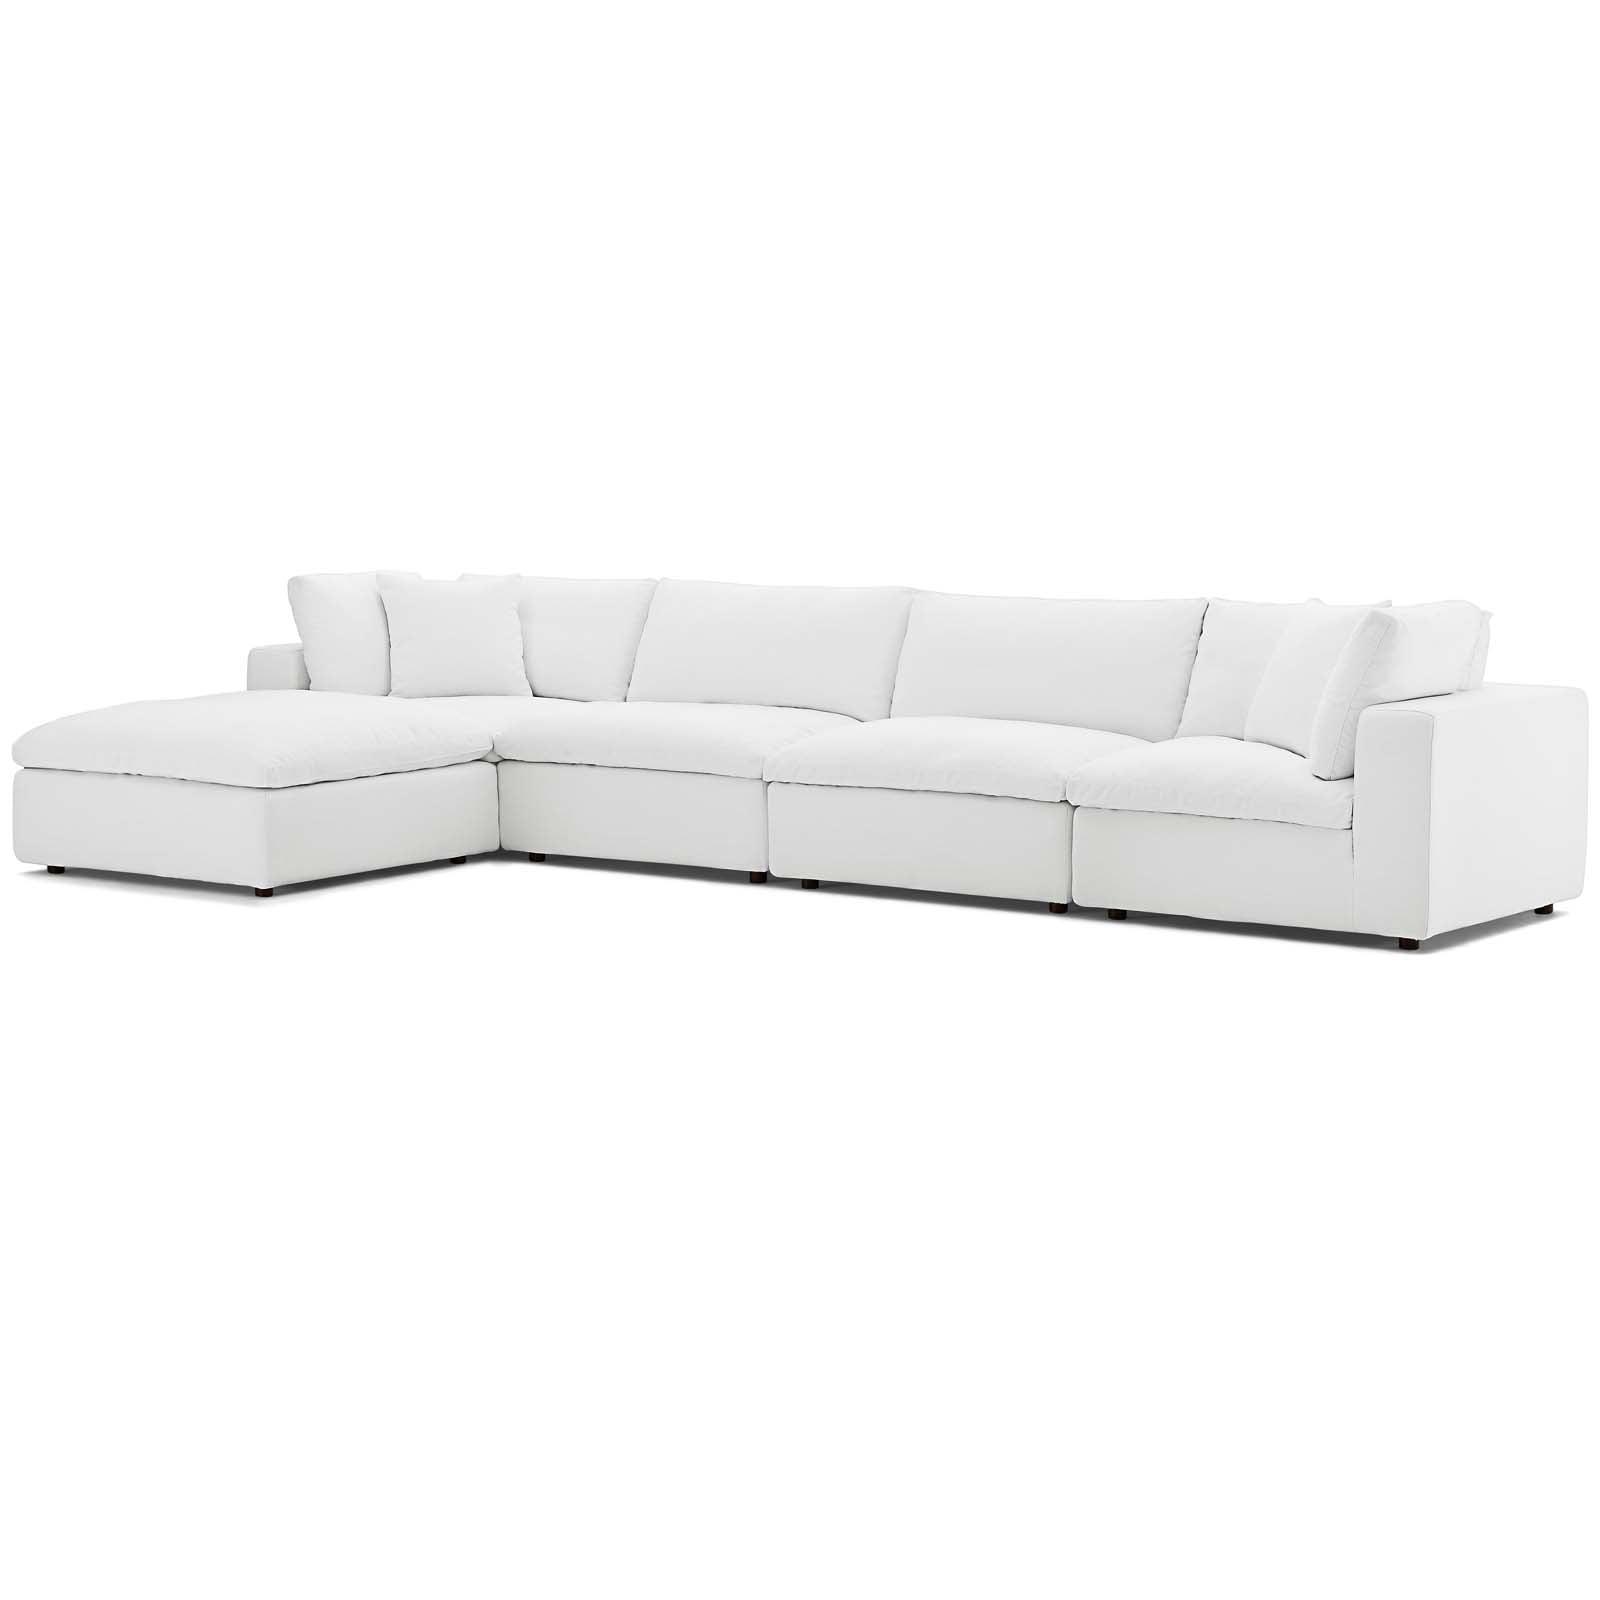 Astounding Modern Contemporary Urban Design Living Room Lounge Club Lobby Sectional Sofa Set Fabric White Pabps2019 Chair Design Images Pabps2019Com